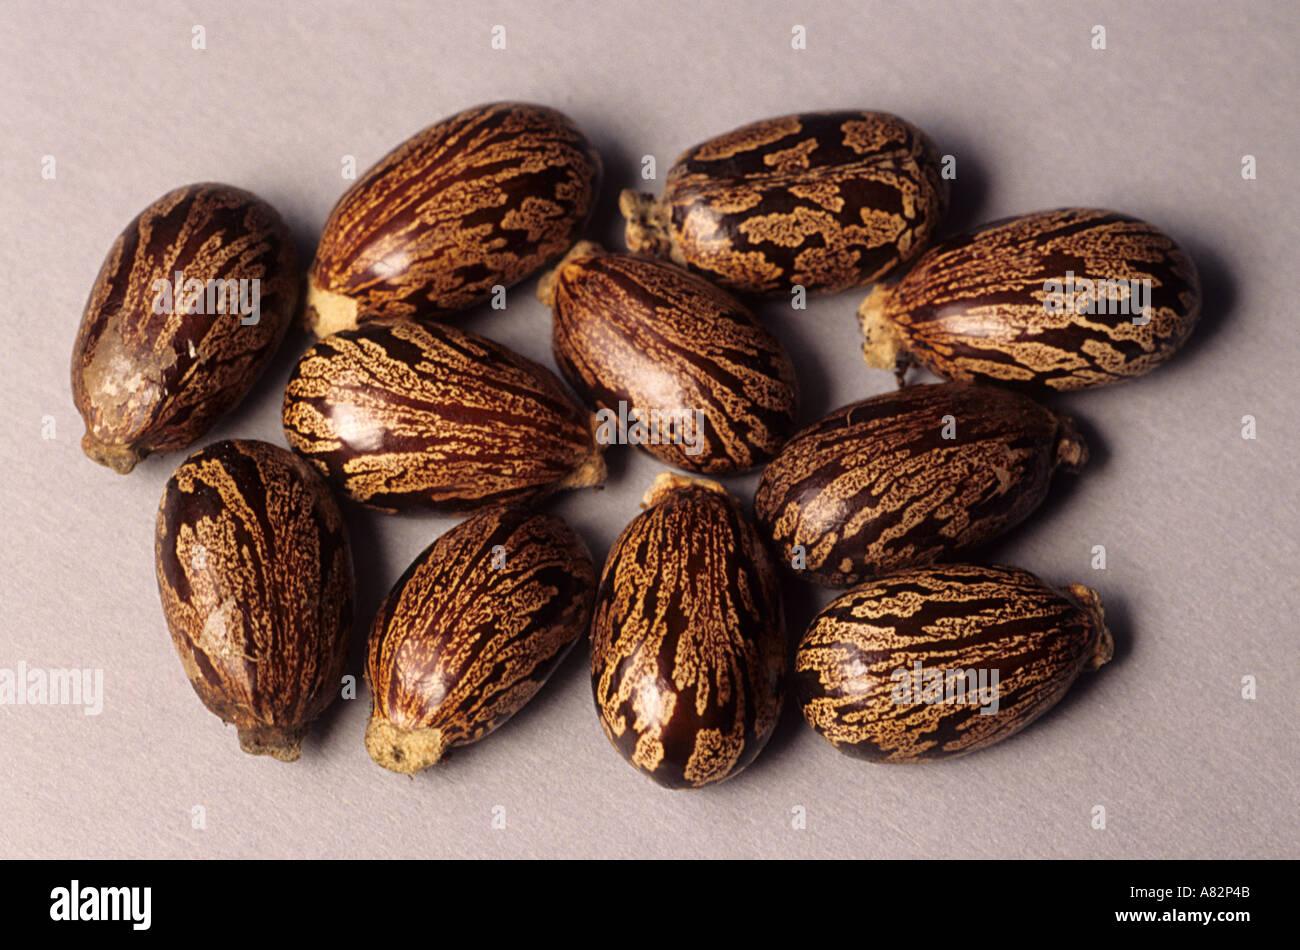 Castor Oil Plant Ricinus Communis Seeds Stock Photo Alamy